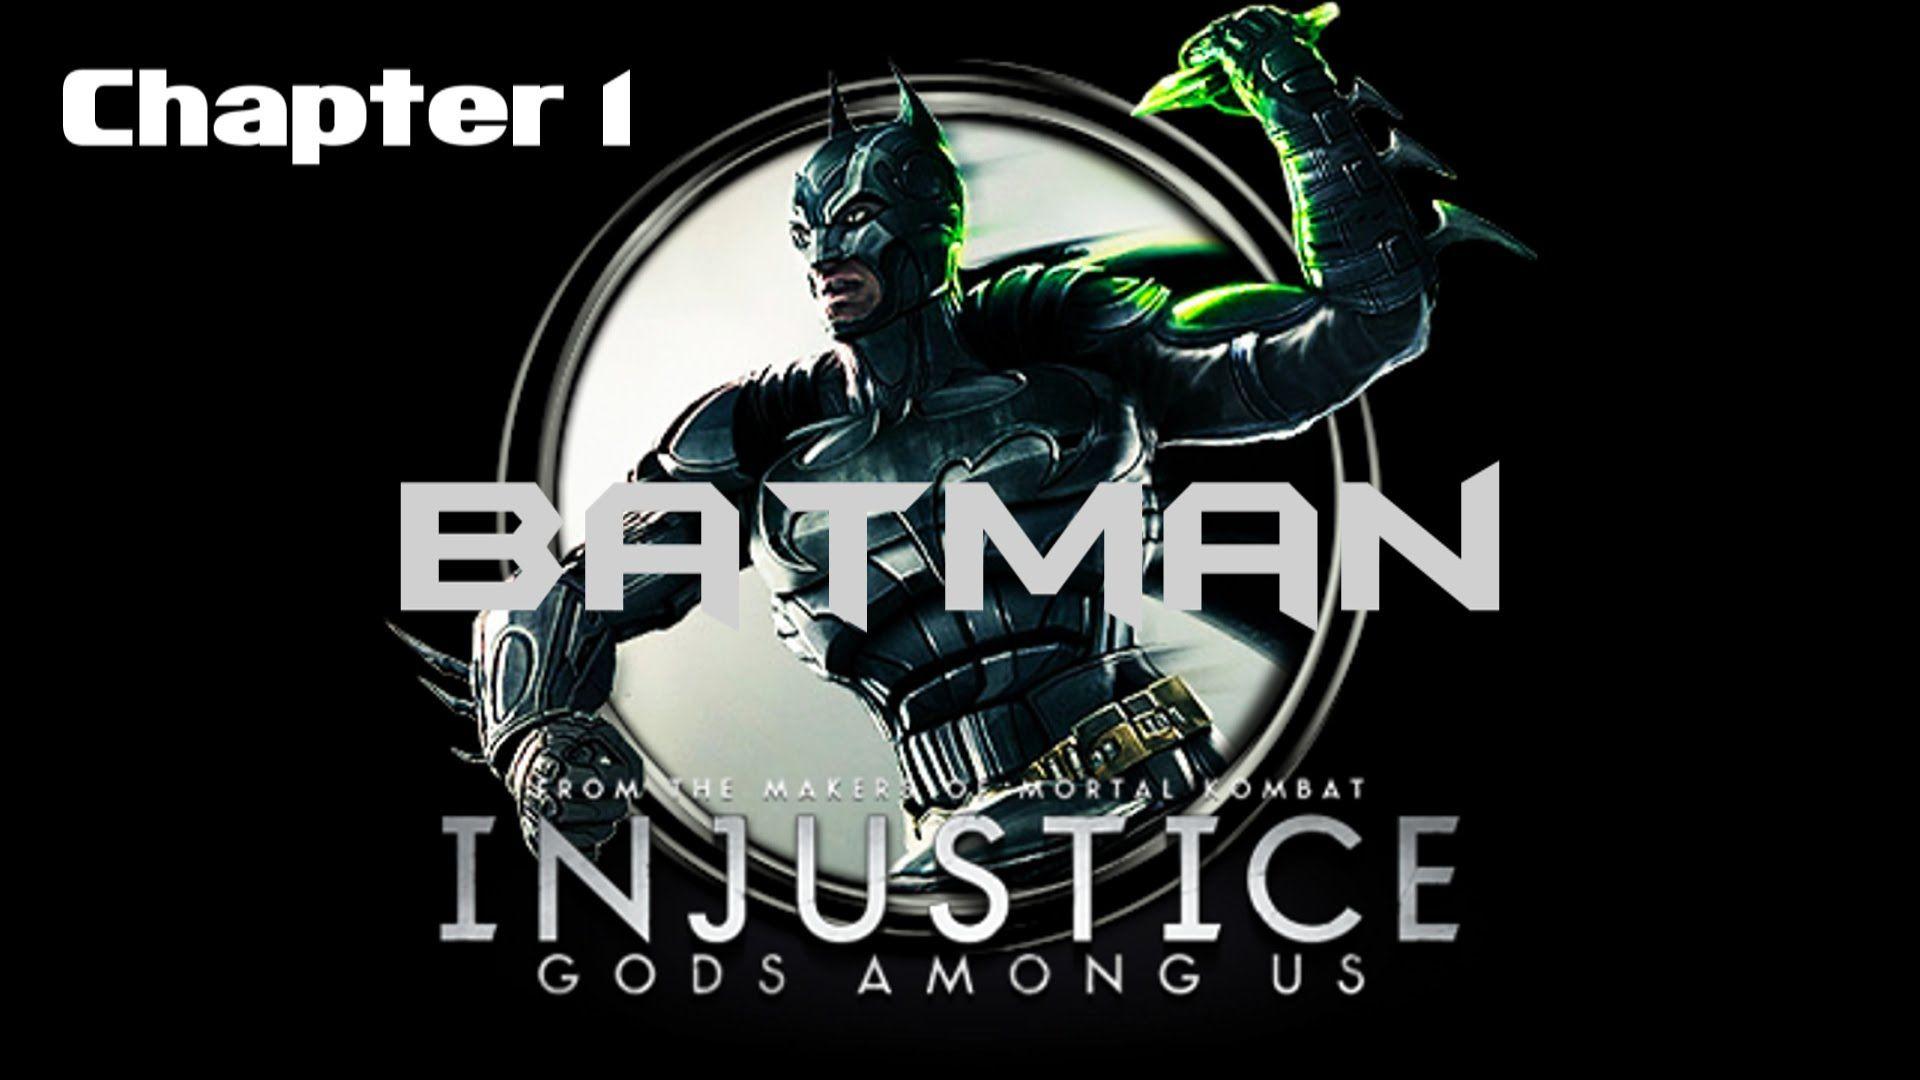 Injustice - Götter unter uns: Chapter 1 - Batman (Game Movie)